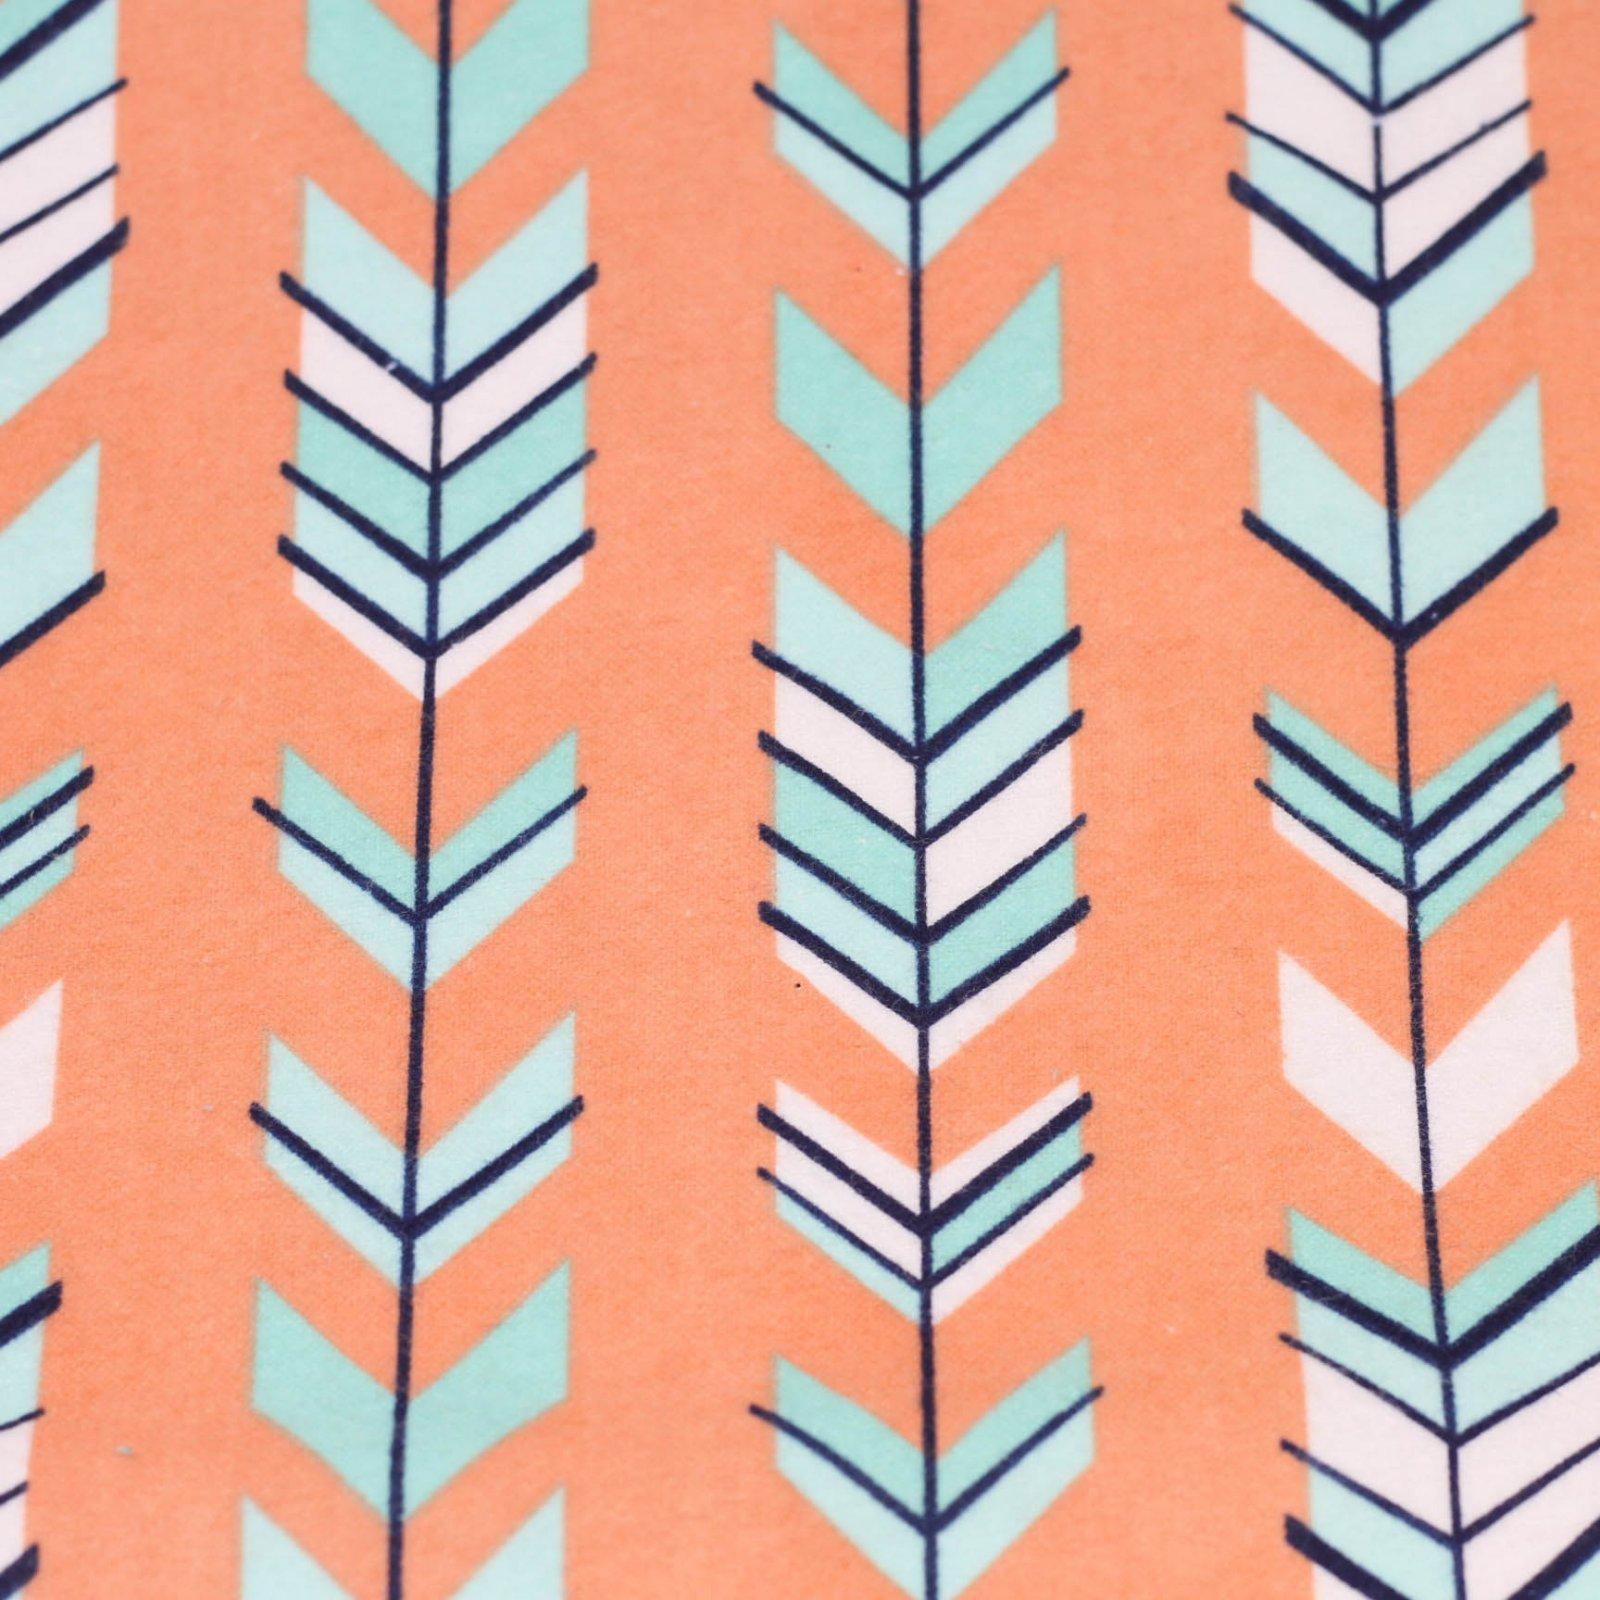 Flannel Orange/Teal/Navy Arrows on Coral